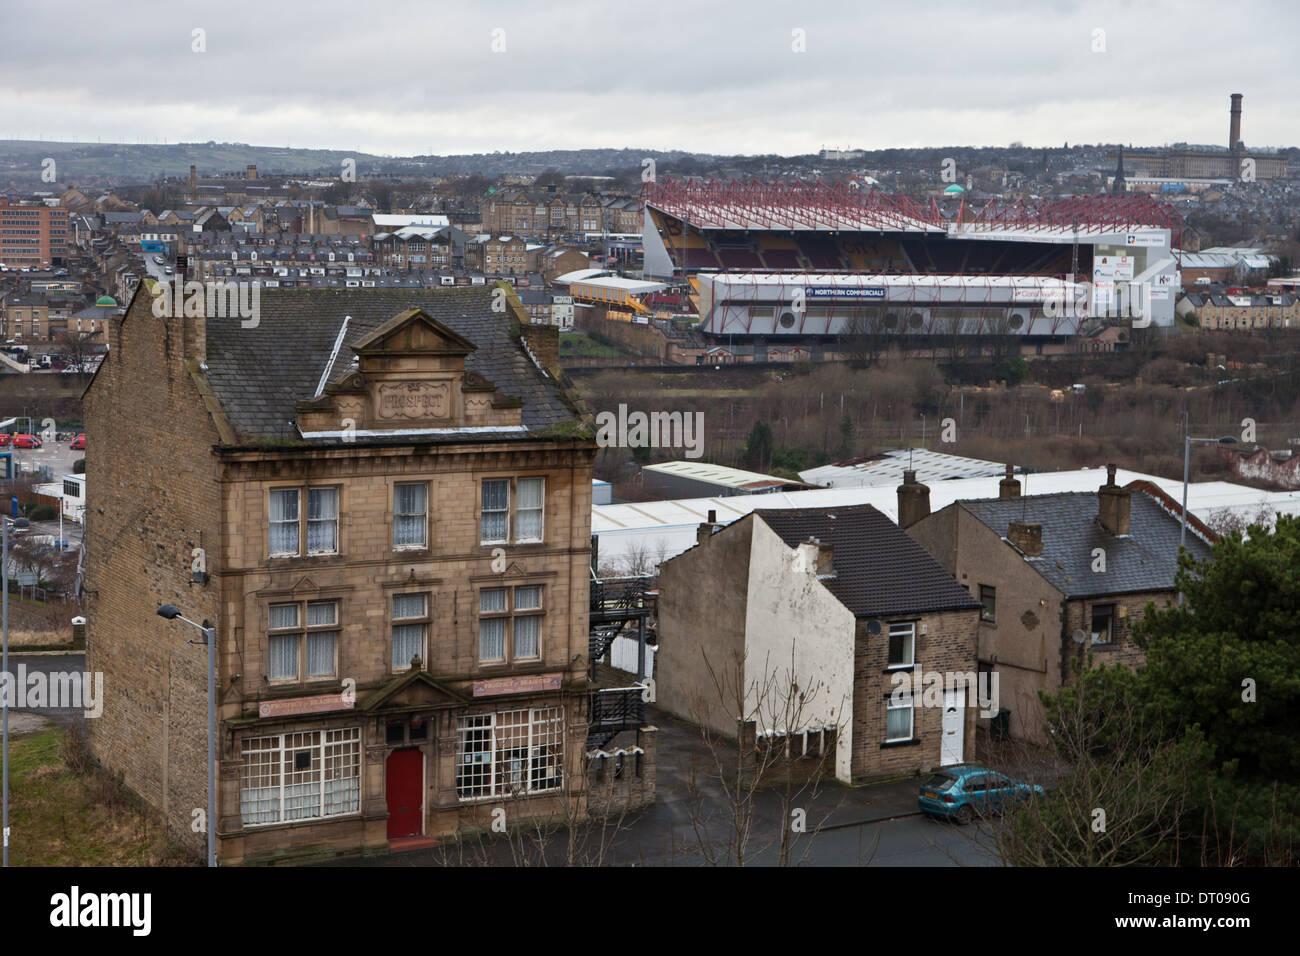 Bradford City Stock Photos & Bradford City Stock Images